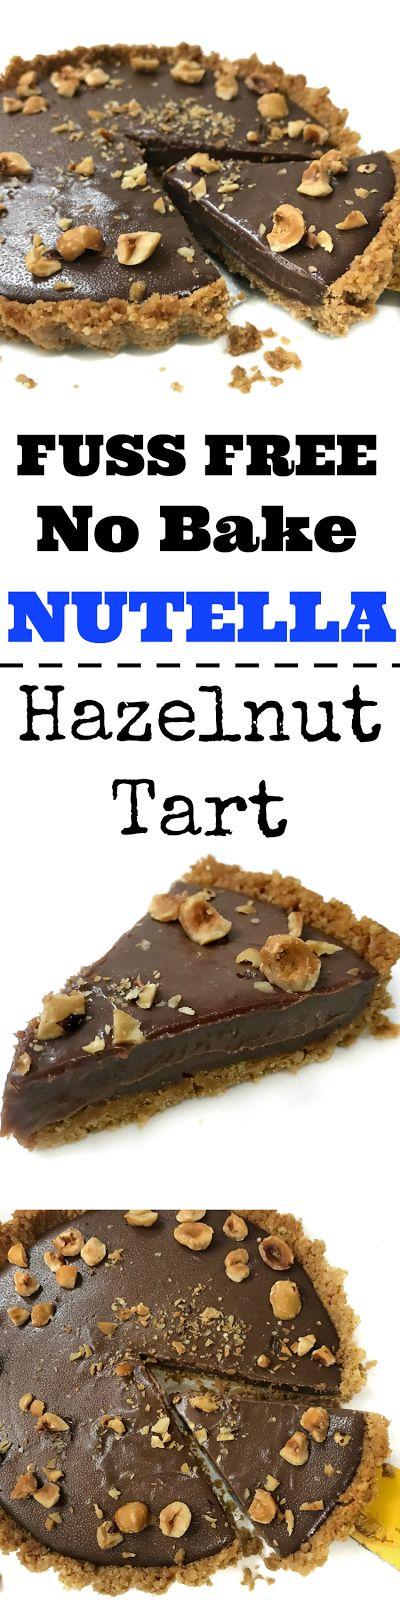 Super yummy fuss free no bake Nutella Hazelnut Tart! Great for parties, potluck and picnics